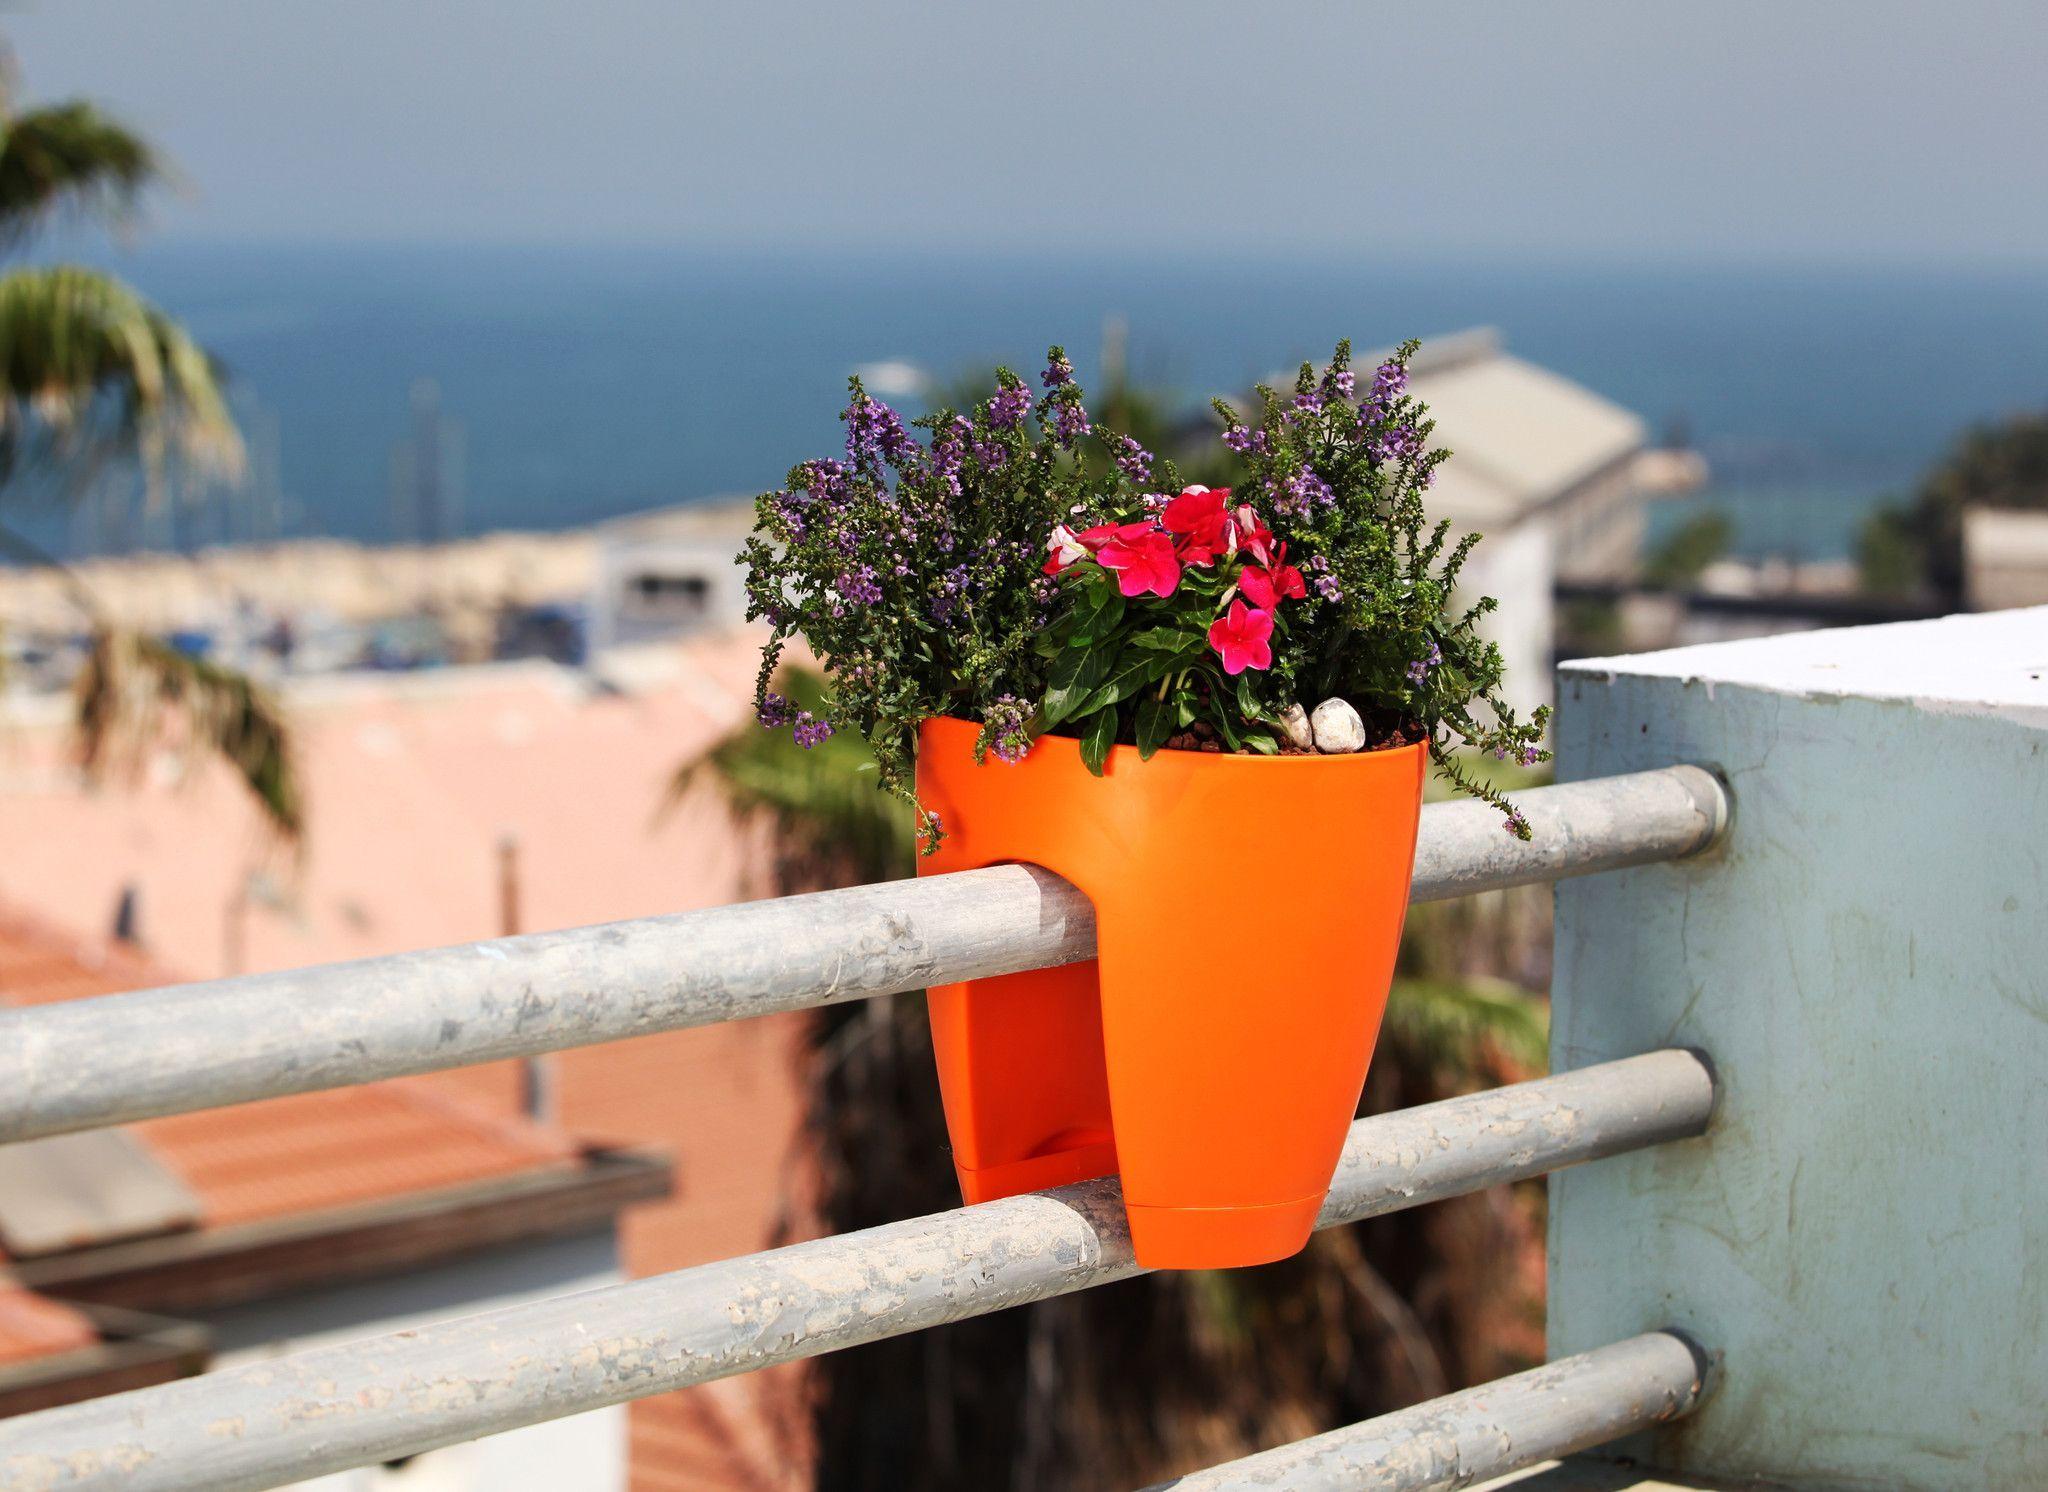 Greenbo Railing And Deck Window Flower Planter Set Of 2 Deck